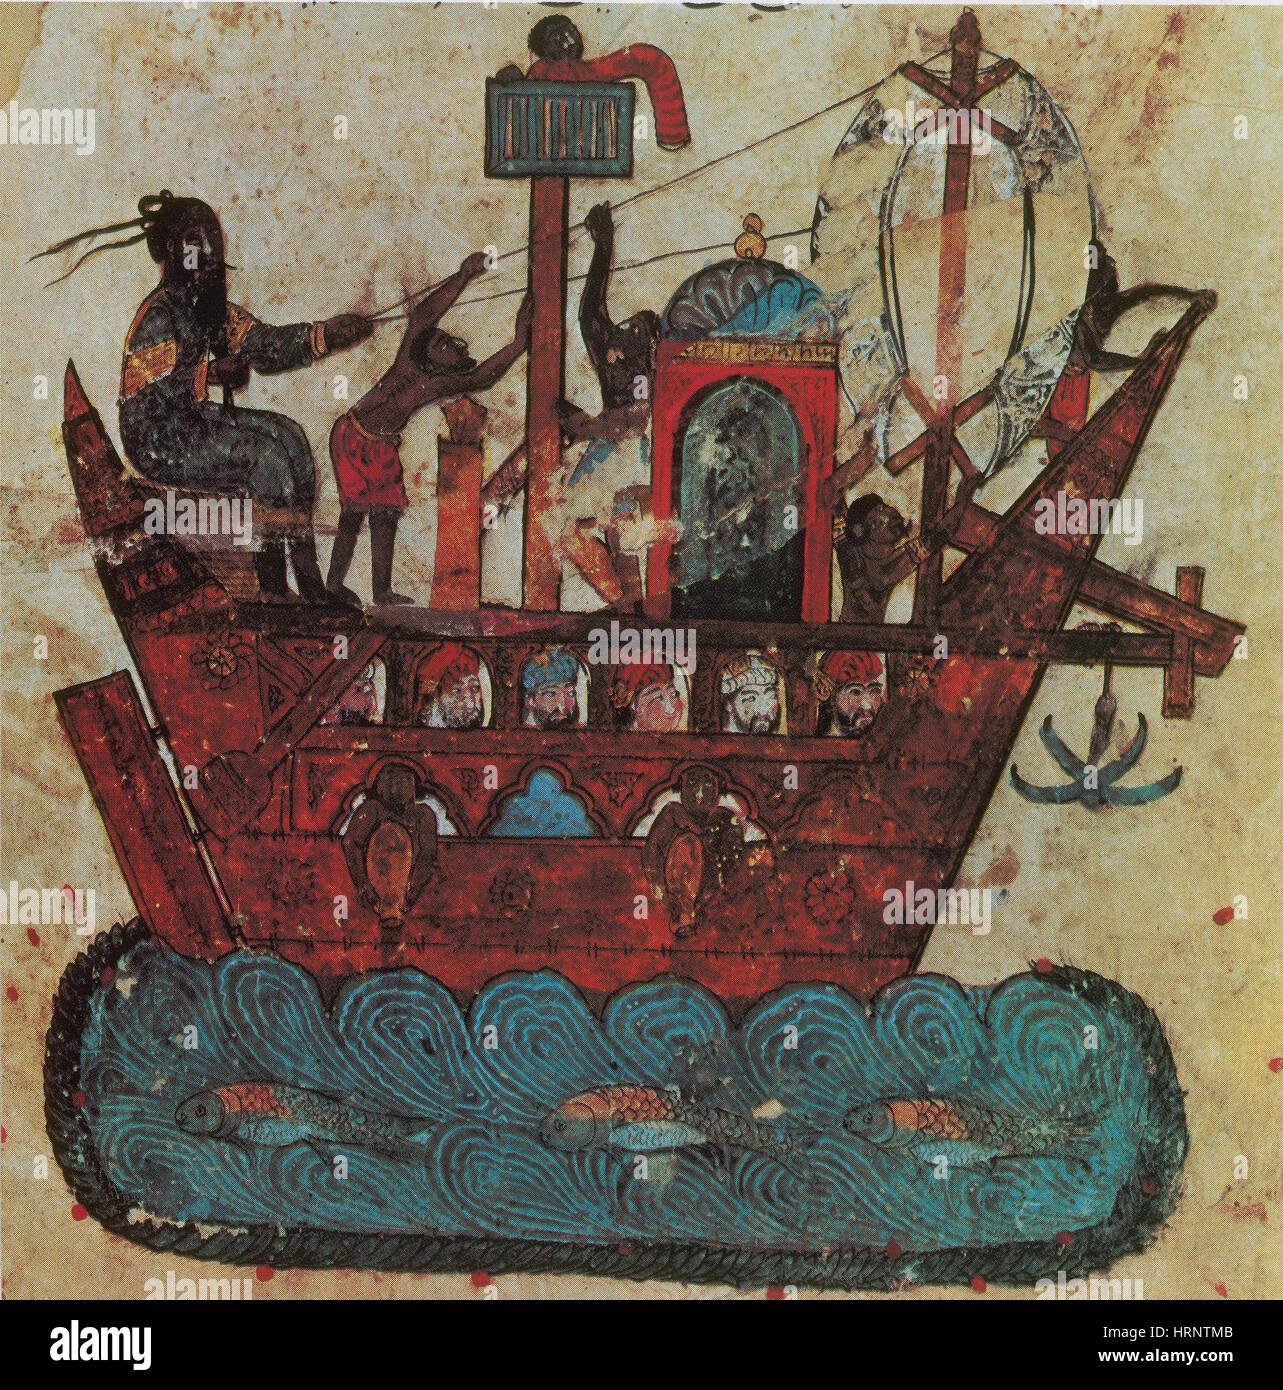 Arab Trade Ship, 13th Century - Stock Image